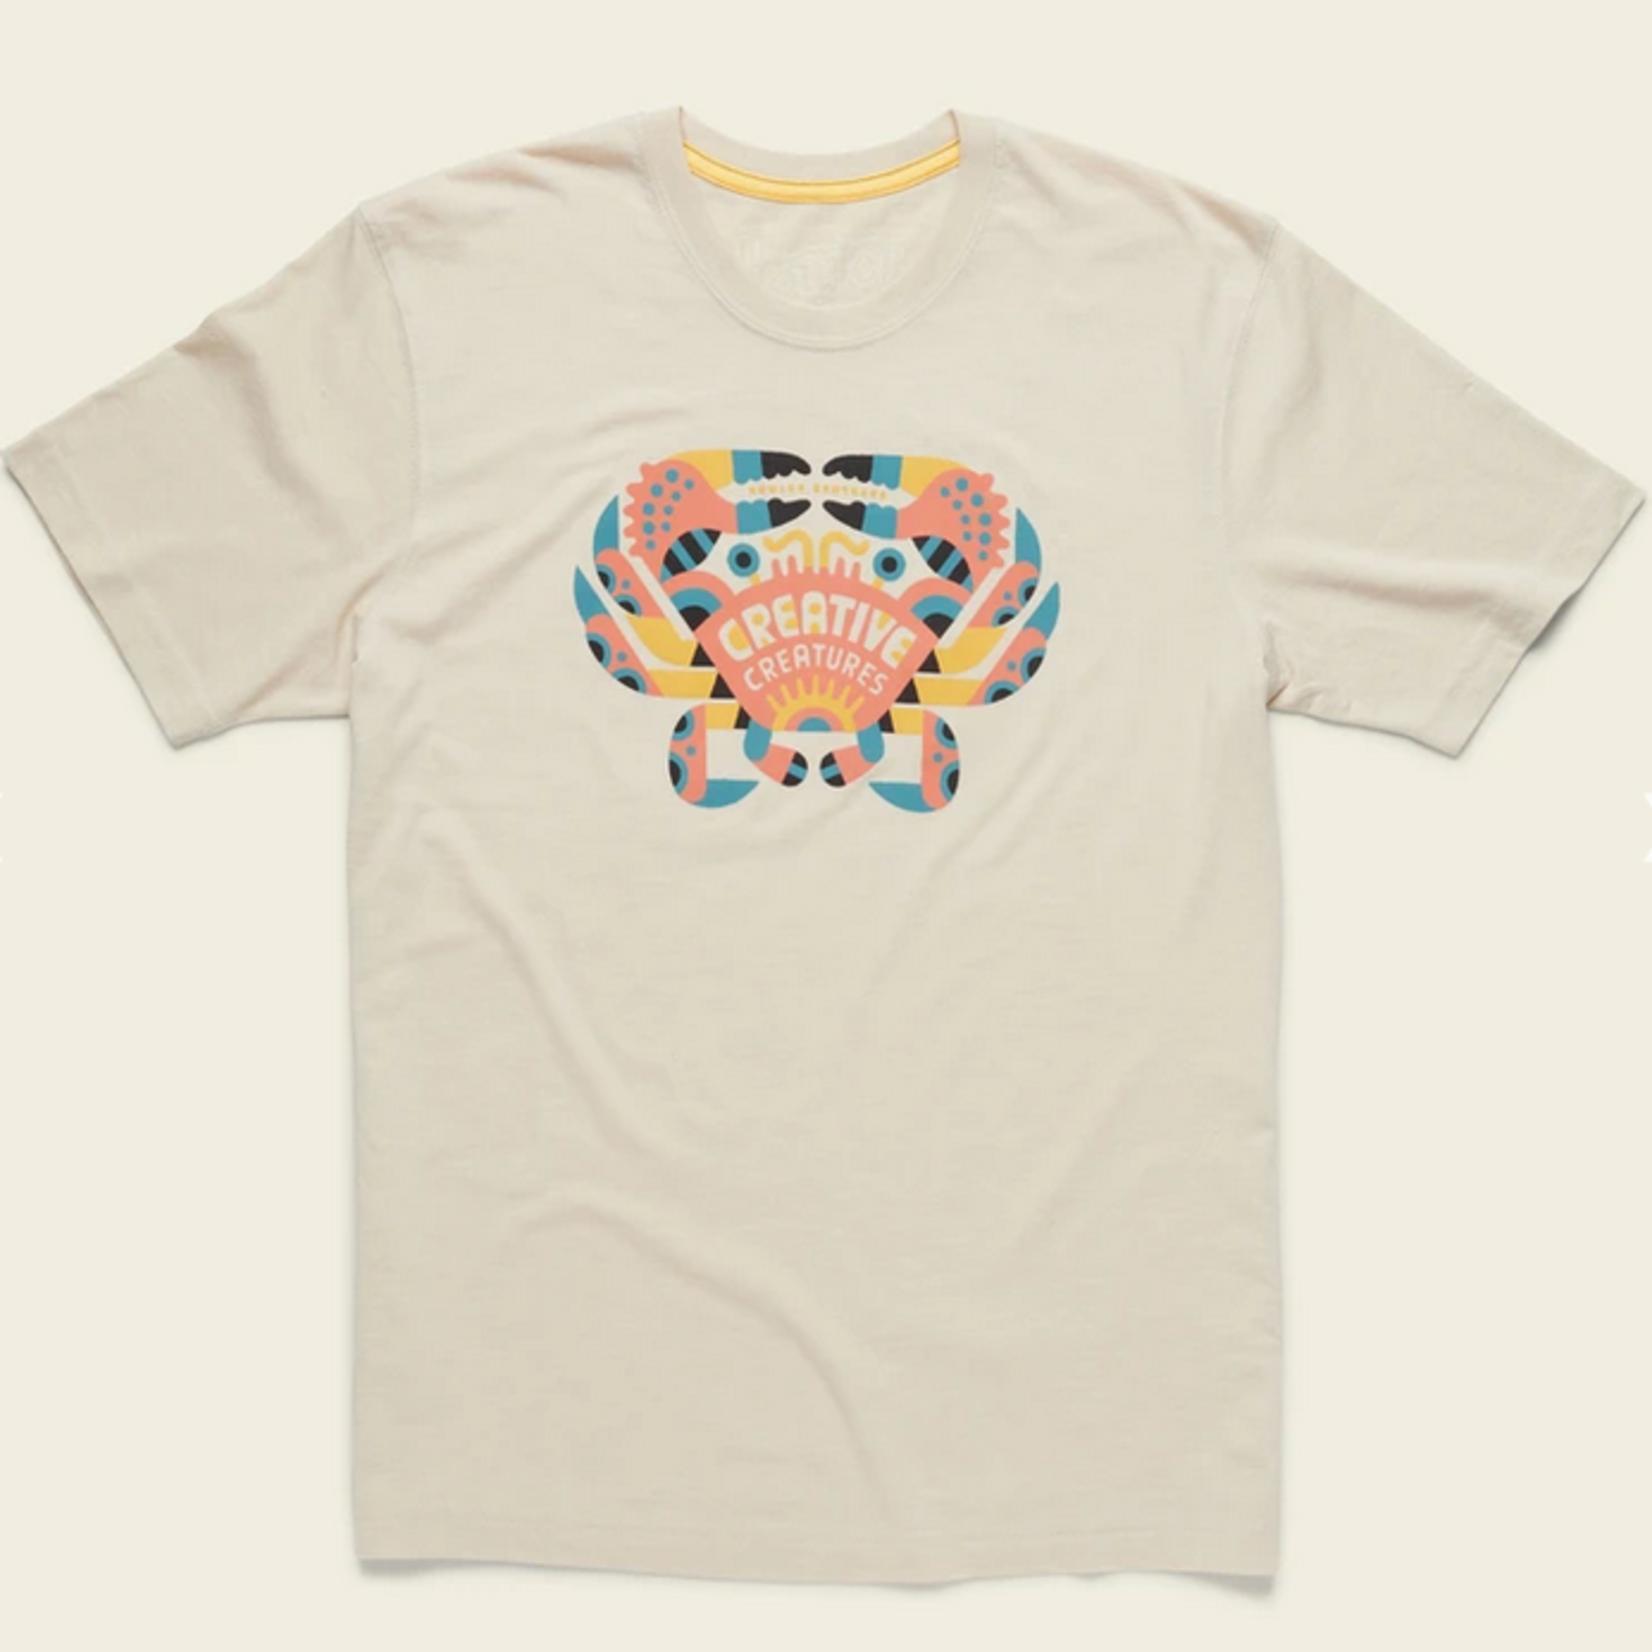 Howler Bros Creative Creatures Crab Sand T-Shirt